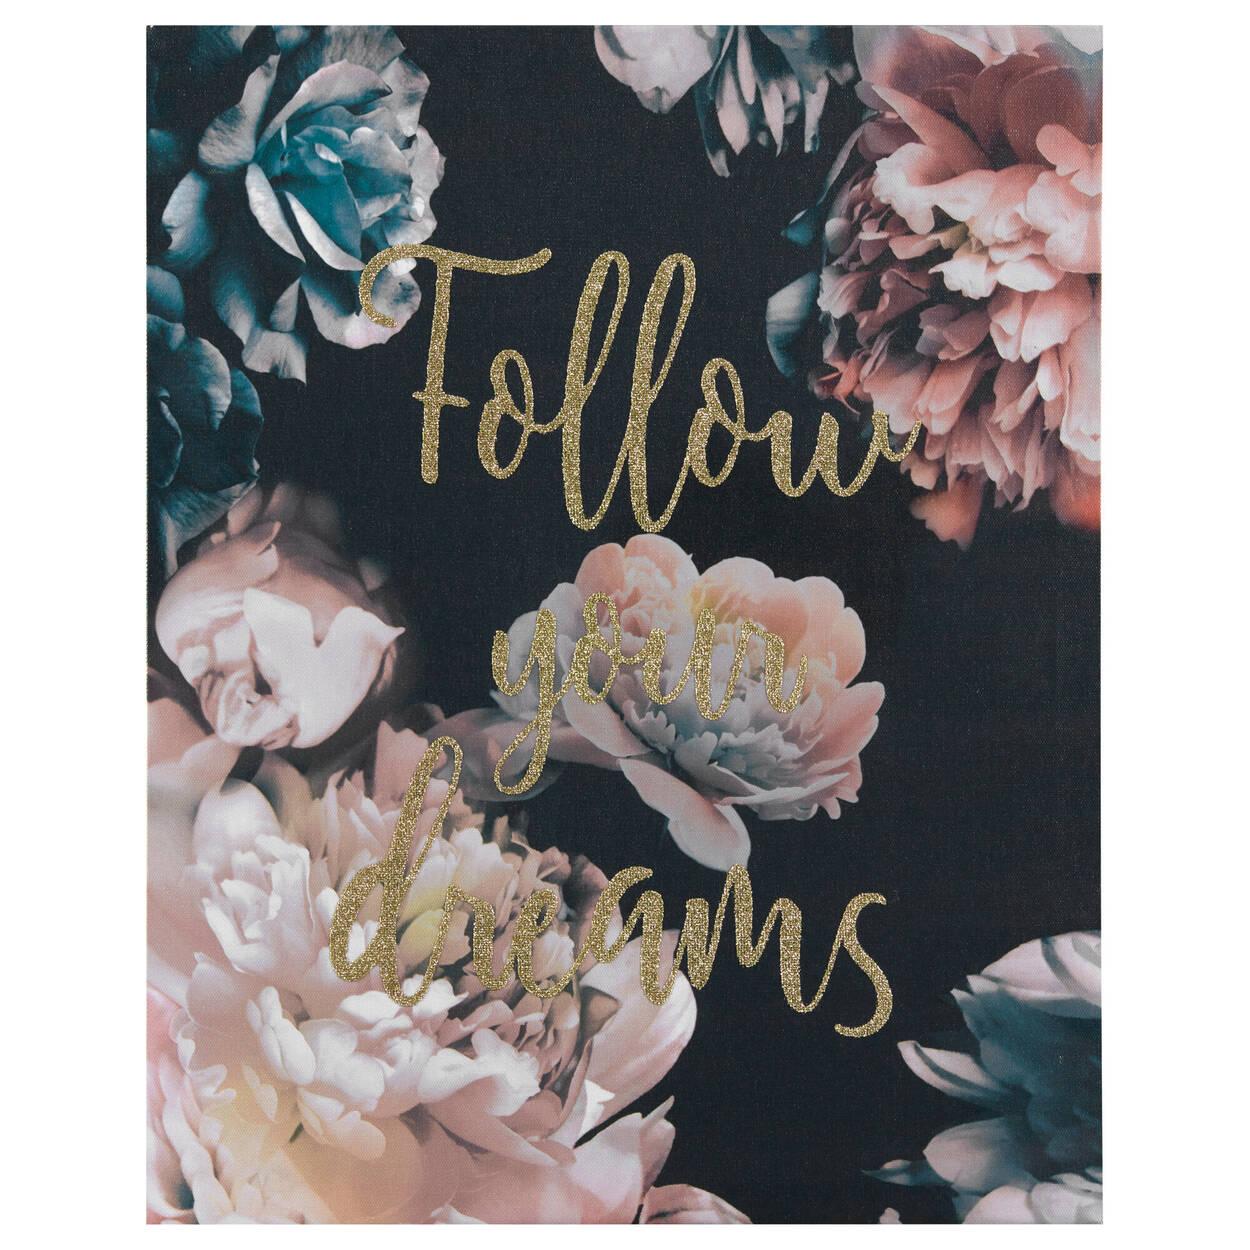 Follow your Dreams Floral Printed Canvas